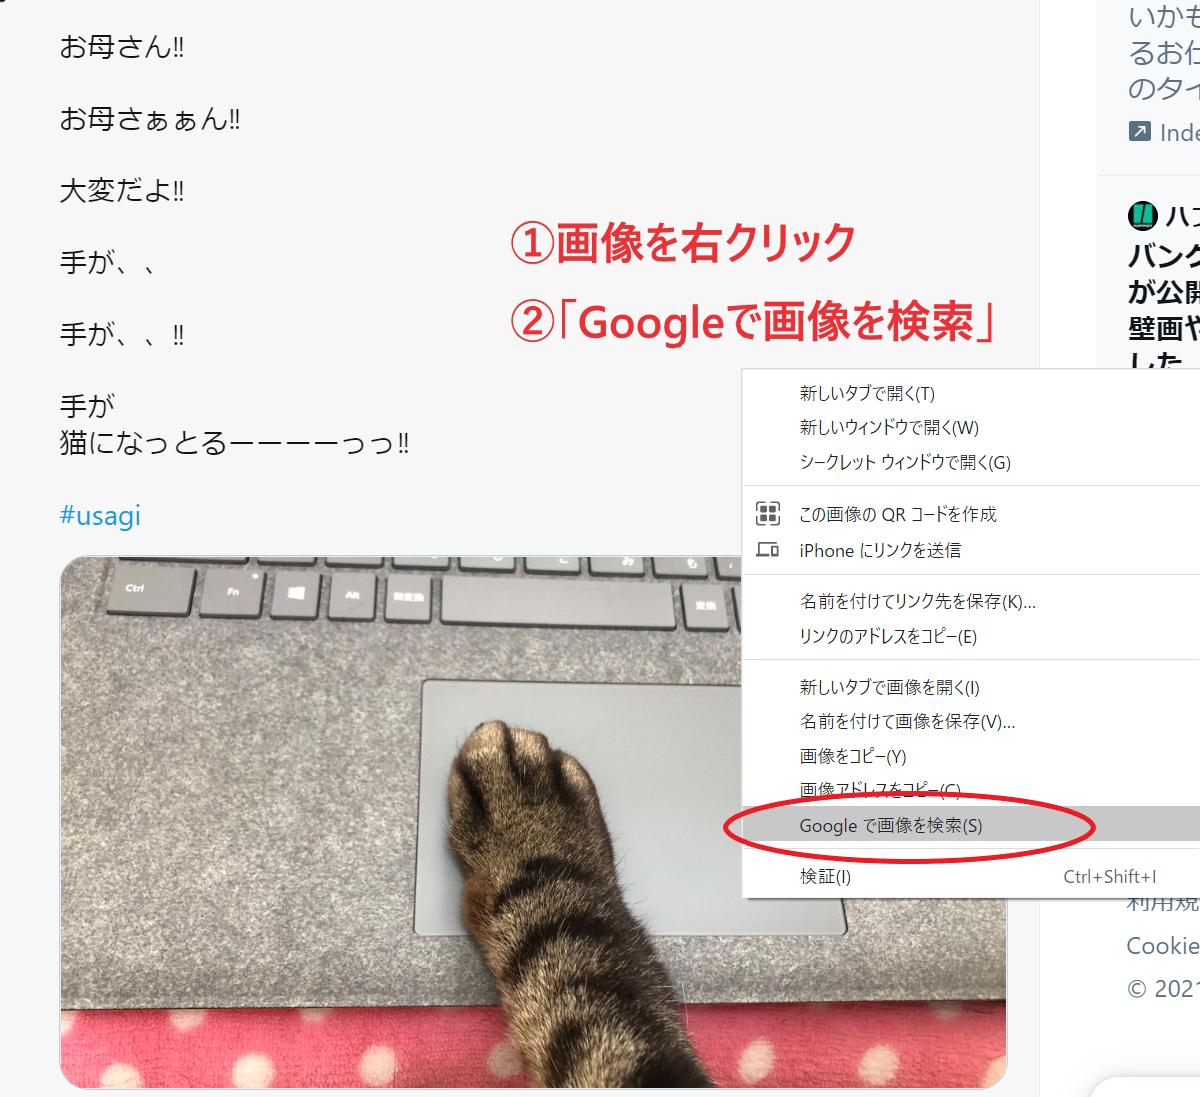 Google画像検索 方法 PC-6